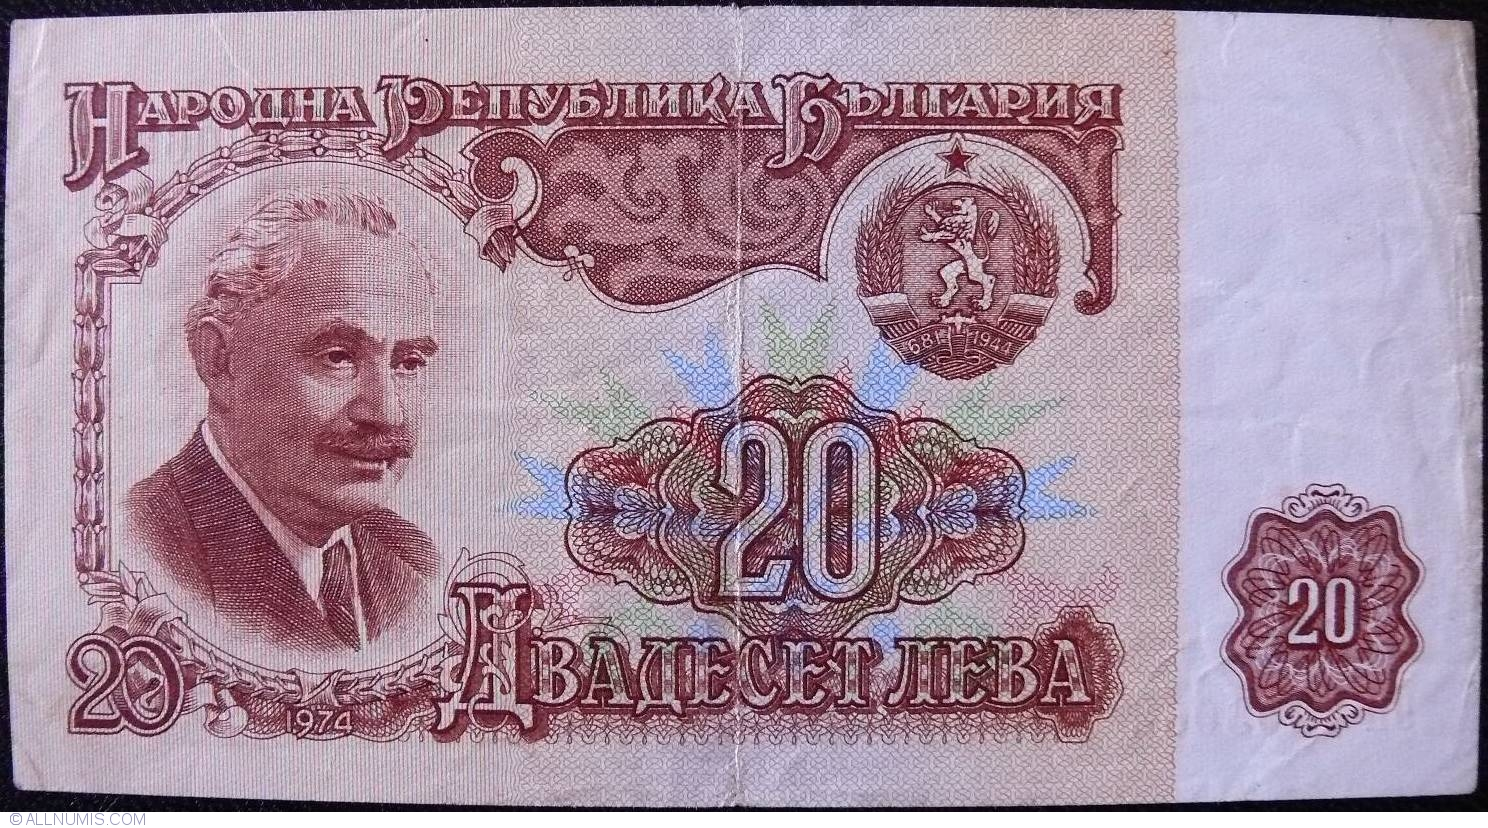 P 95   Uncirculated Banknotes BULGARIA 5  LEVA  1974